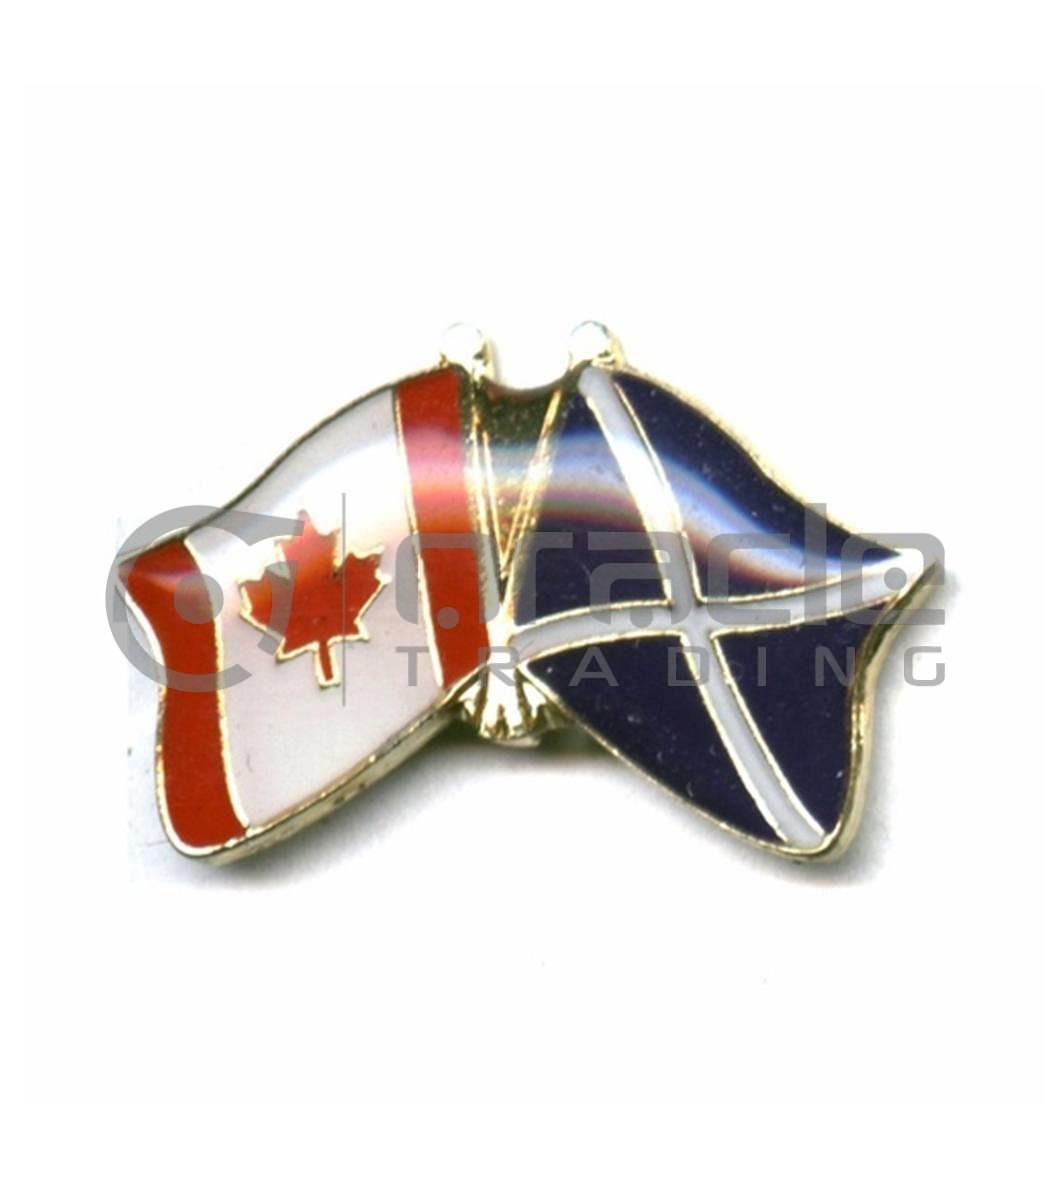 Scotland / Canada Friendship Lapel Pin (St. Andrew's Cross)